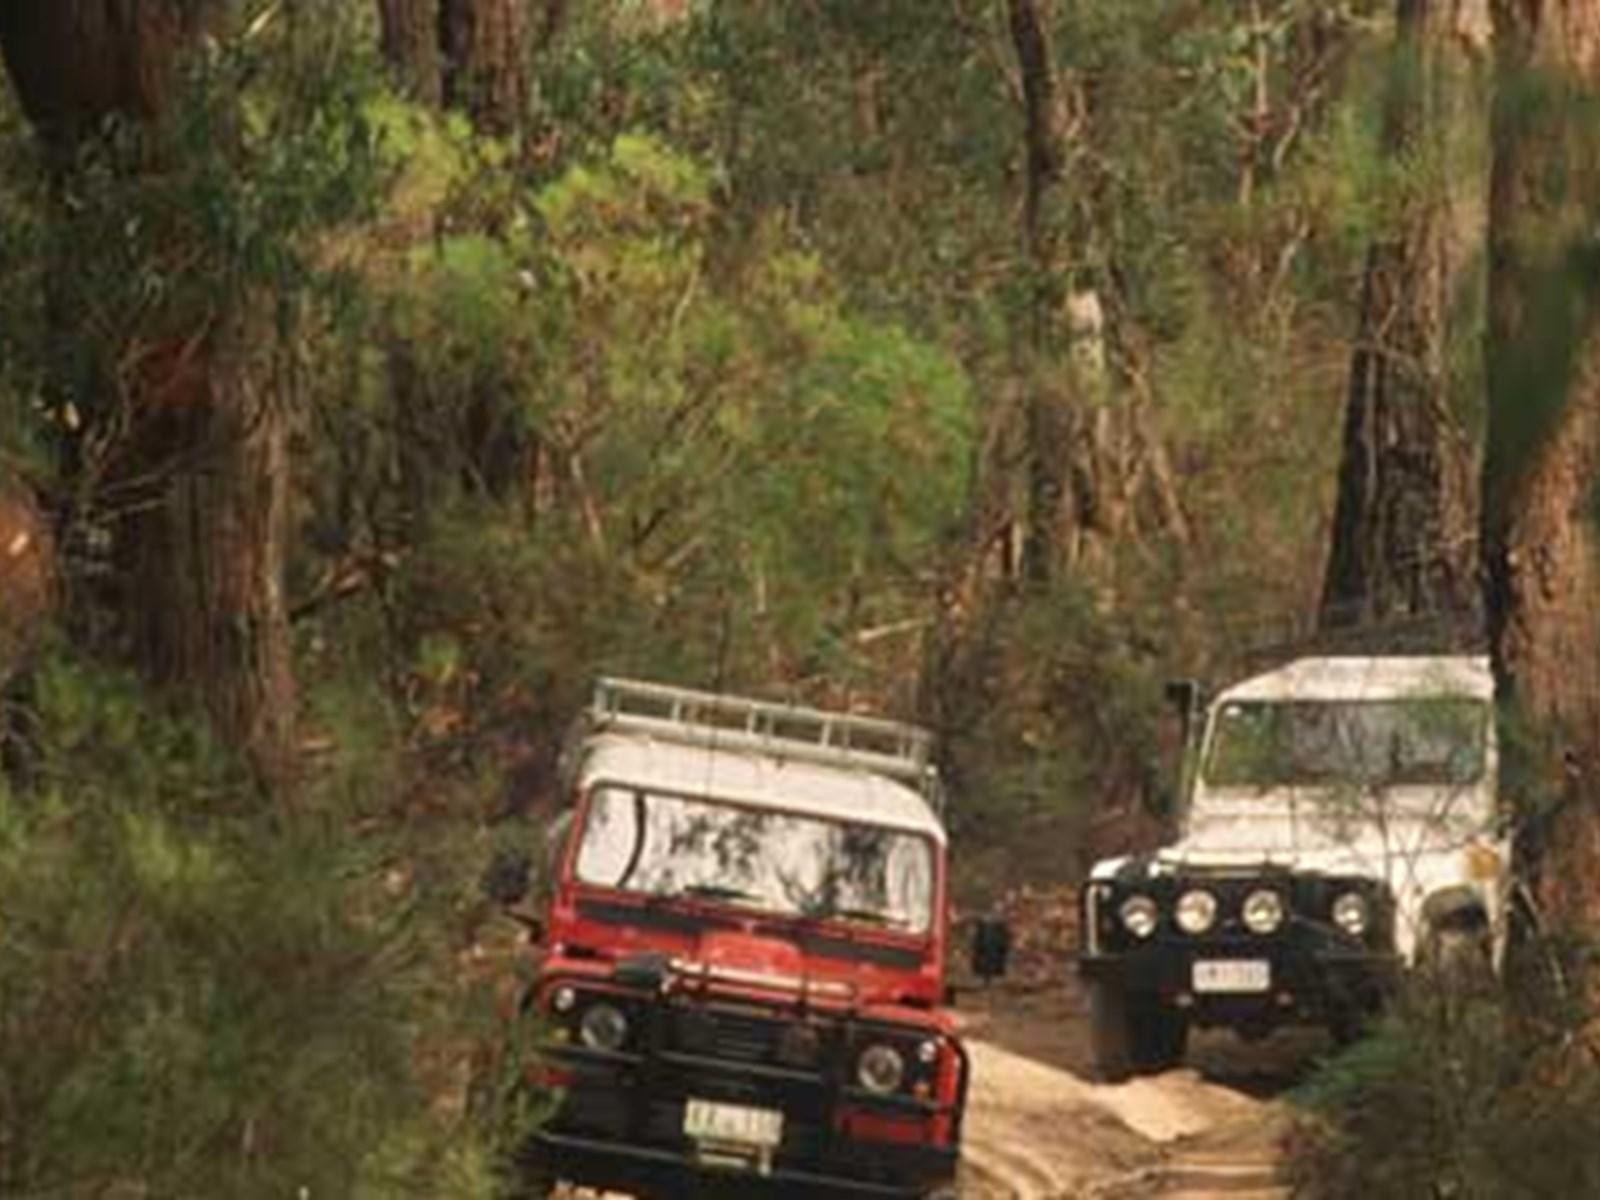 Four-wheel driving, Gippsland, Victoria, Australia